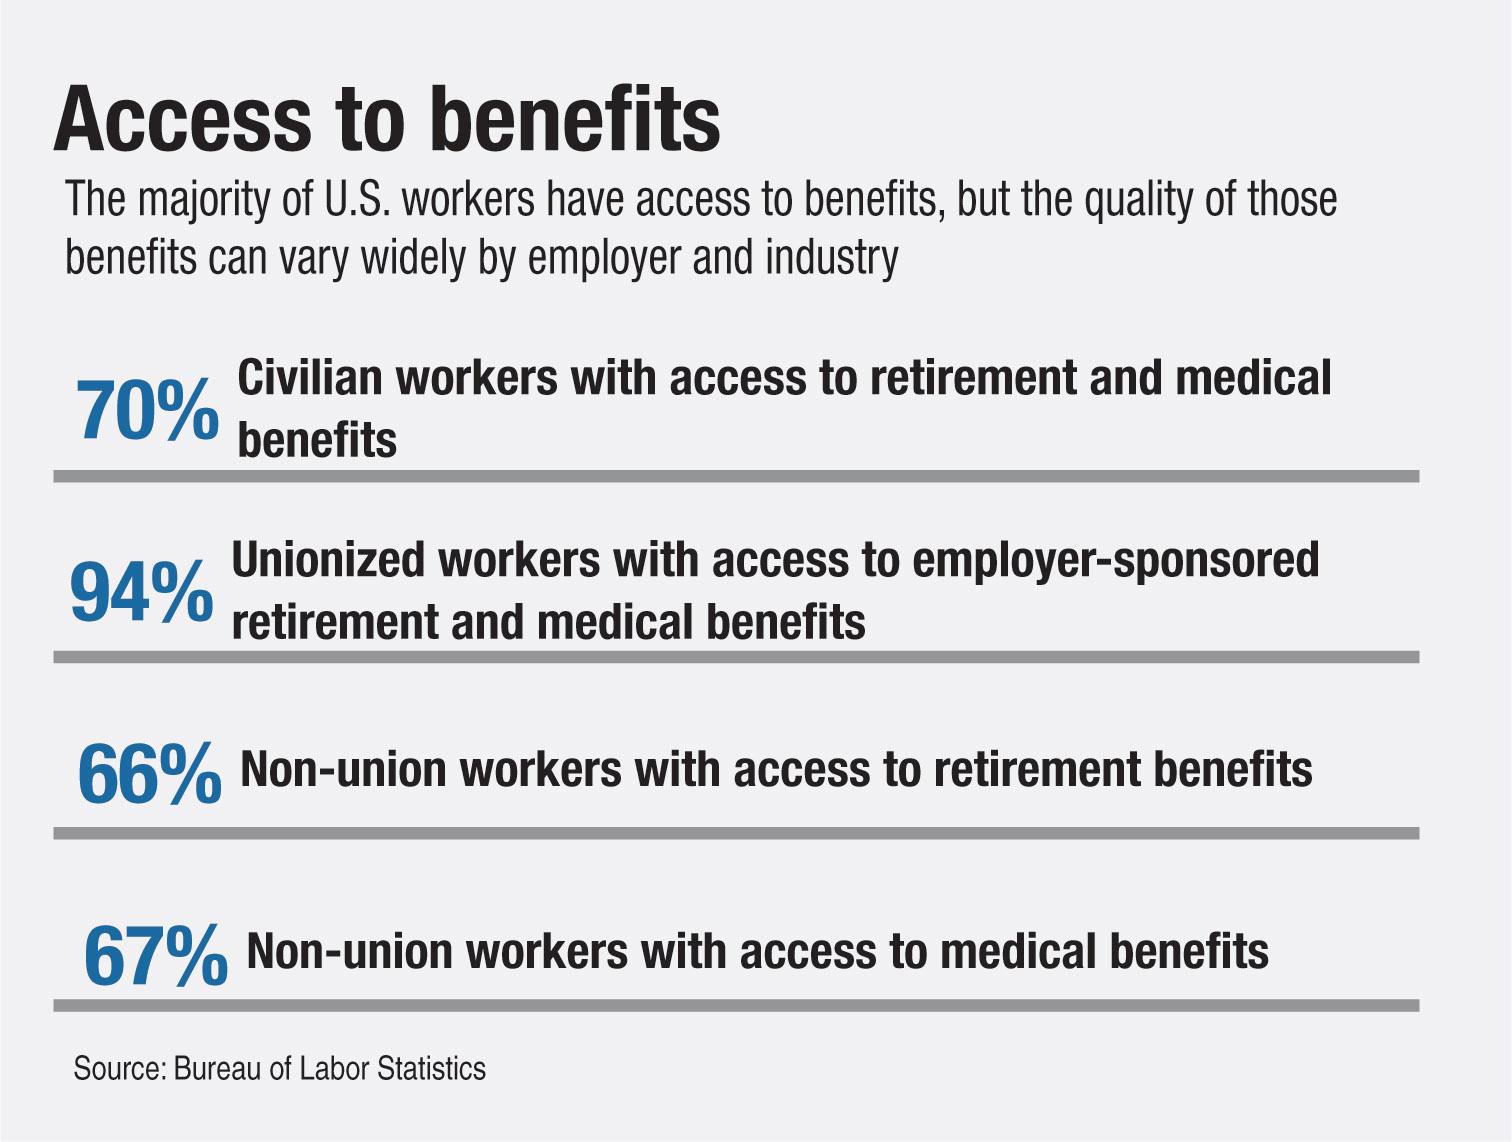 https://assets.sourcemedia.com/51/01/4d15e8eb4b668f98adf365da12d5/us-benefits-stats-cuj-091517.jpg